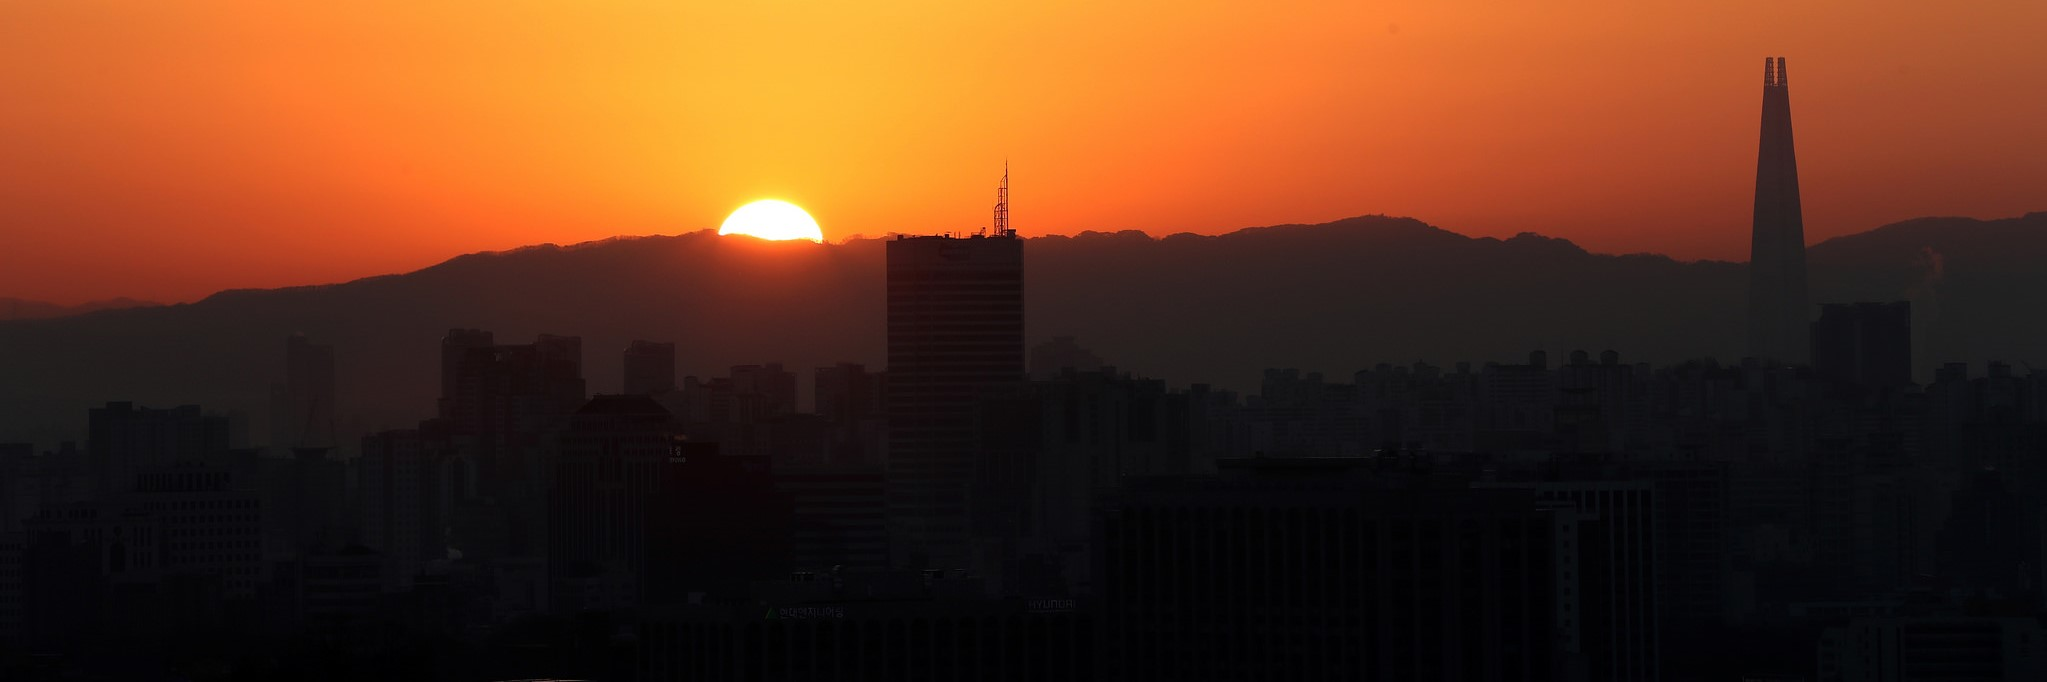 Sunrise in Seoul, January 2018 (Photo: Republic of Korea/Flickr)